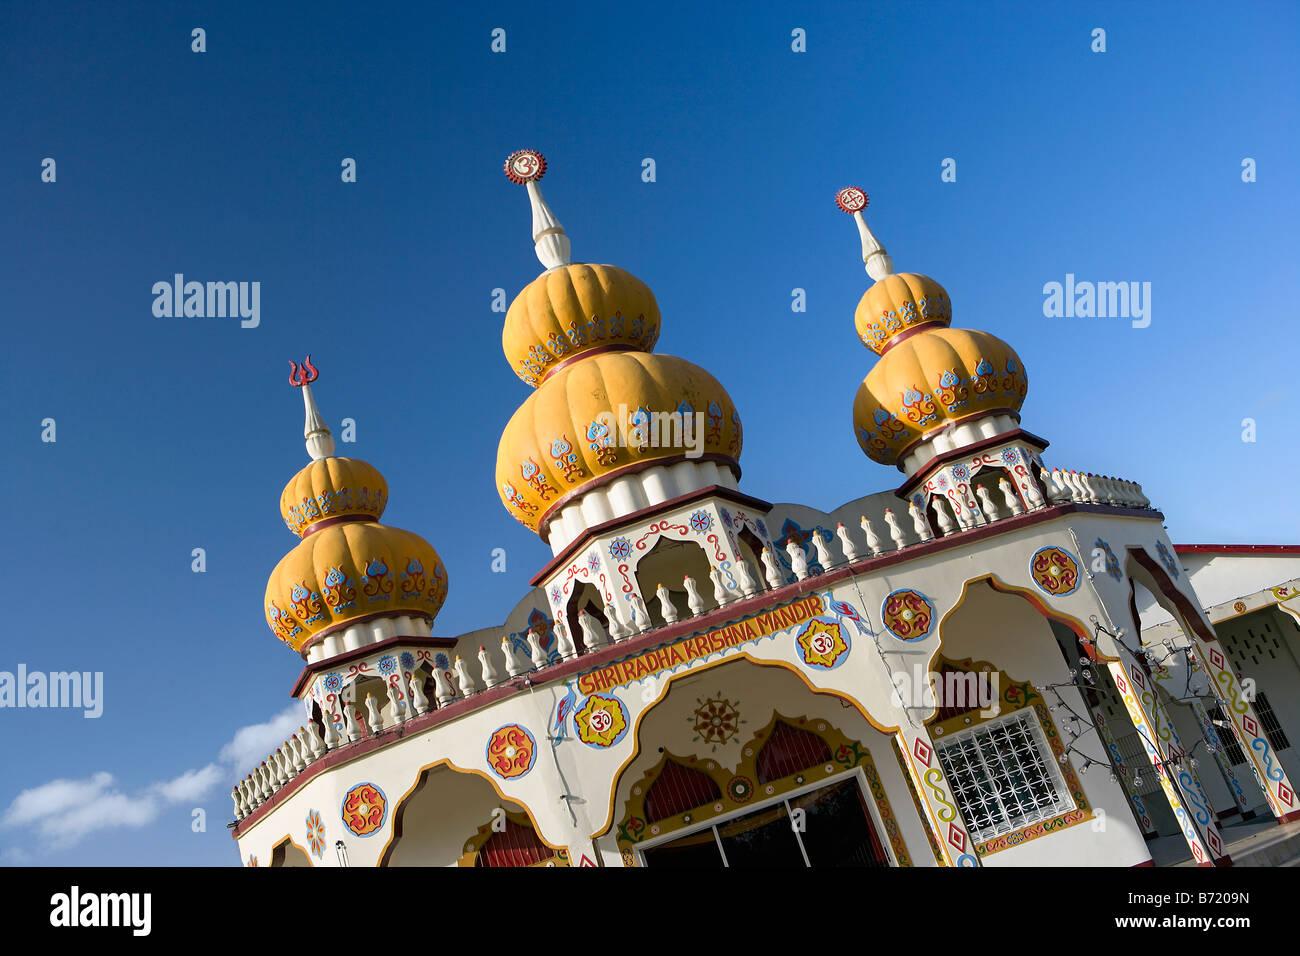 Suriname, Paramaribo, Hindu temple or mandir. - Stock Image